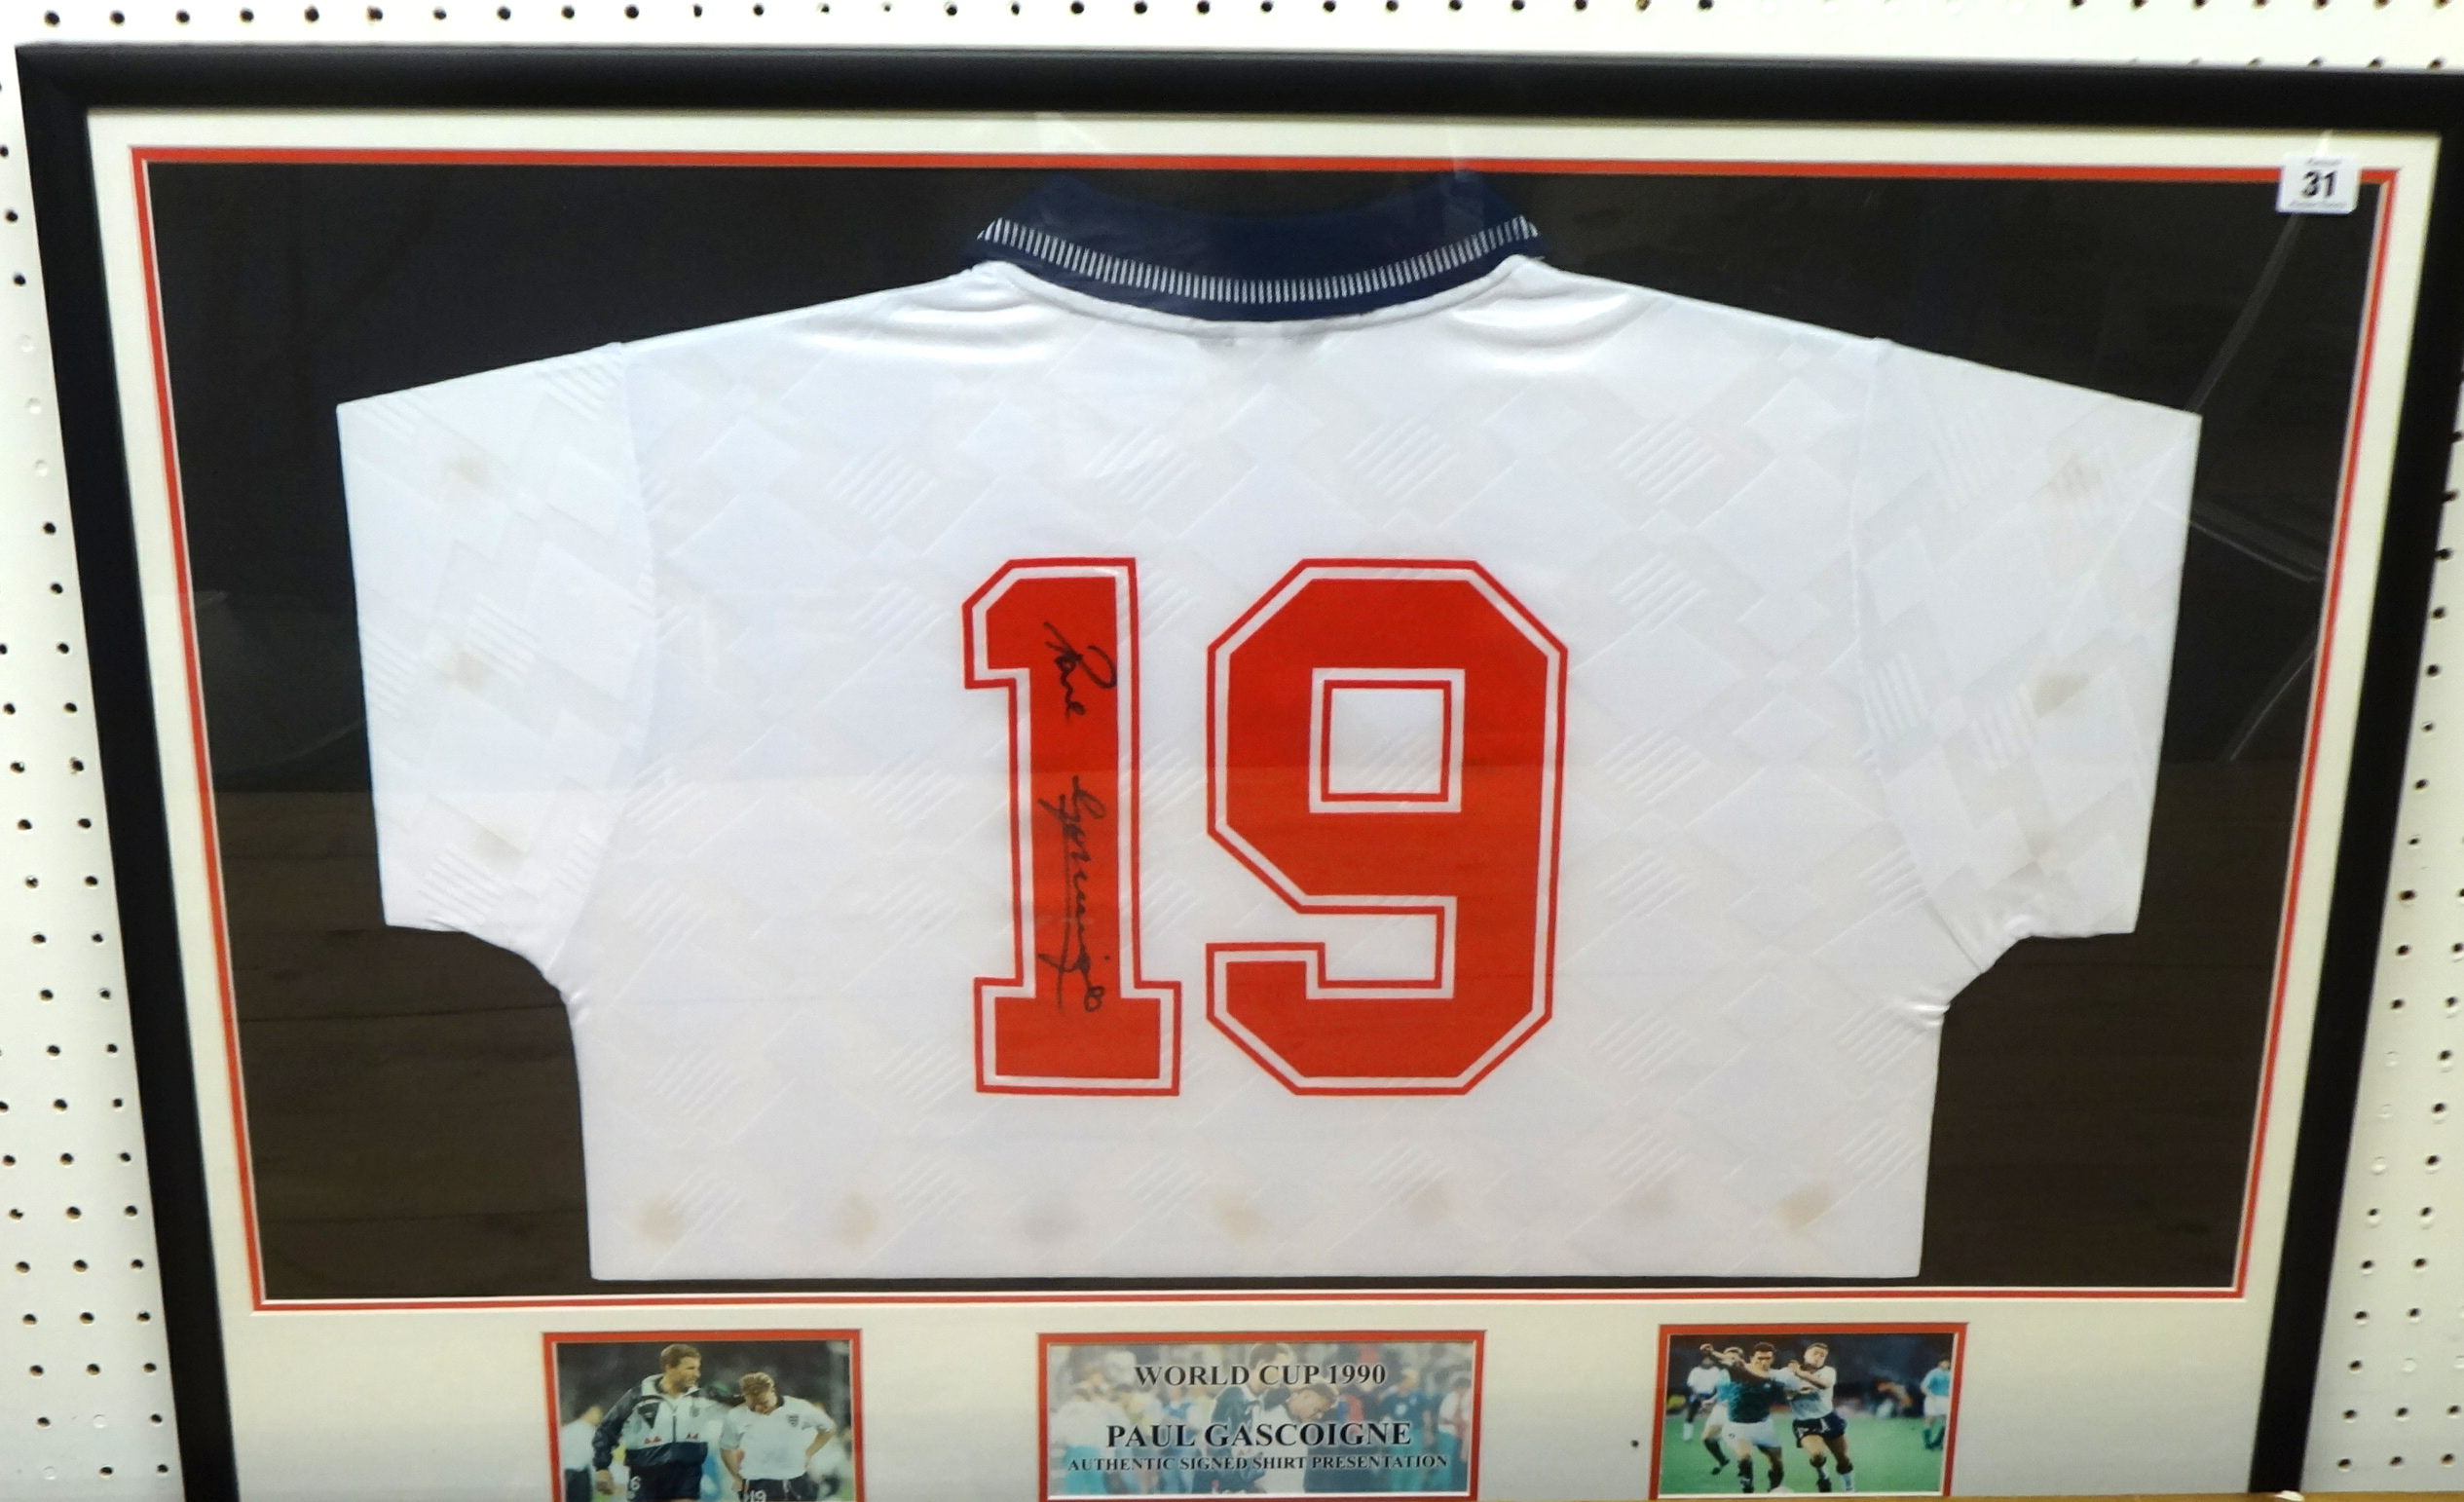 OF FOOTBALL INTEREST England shirt No 19 signed by Paul Gascoigne ...